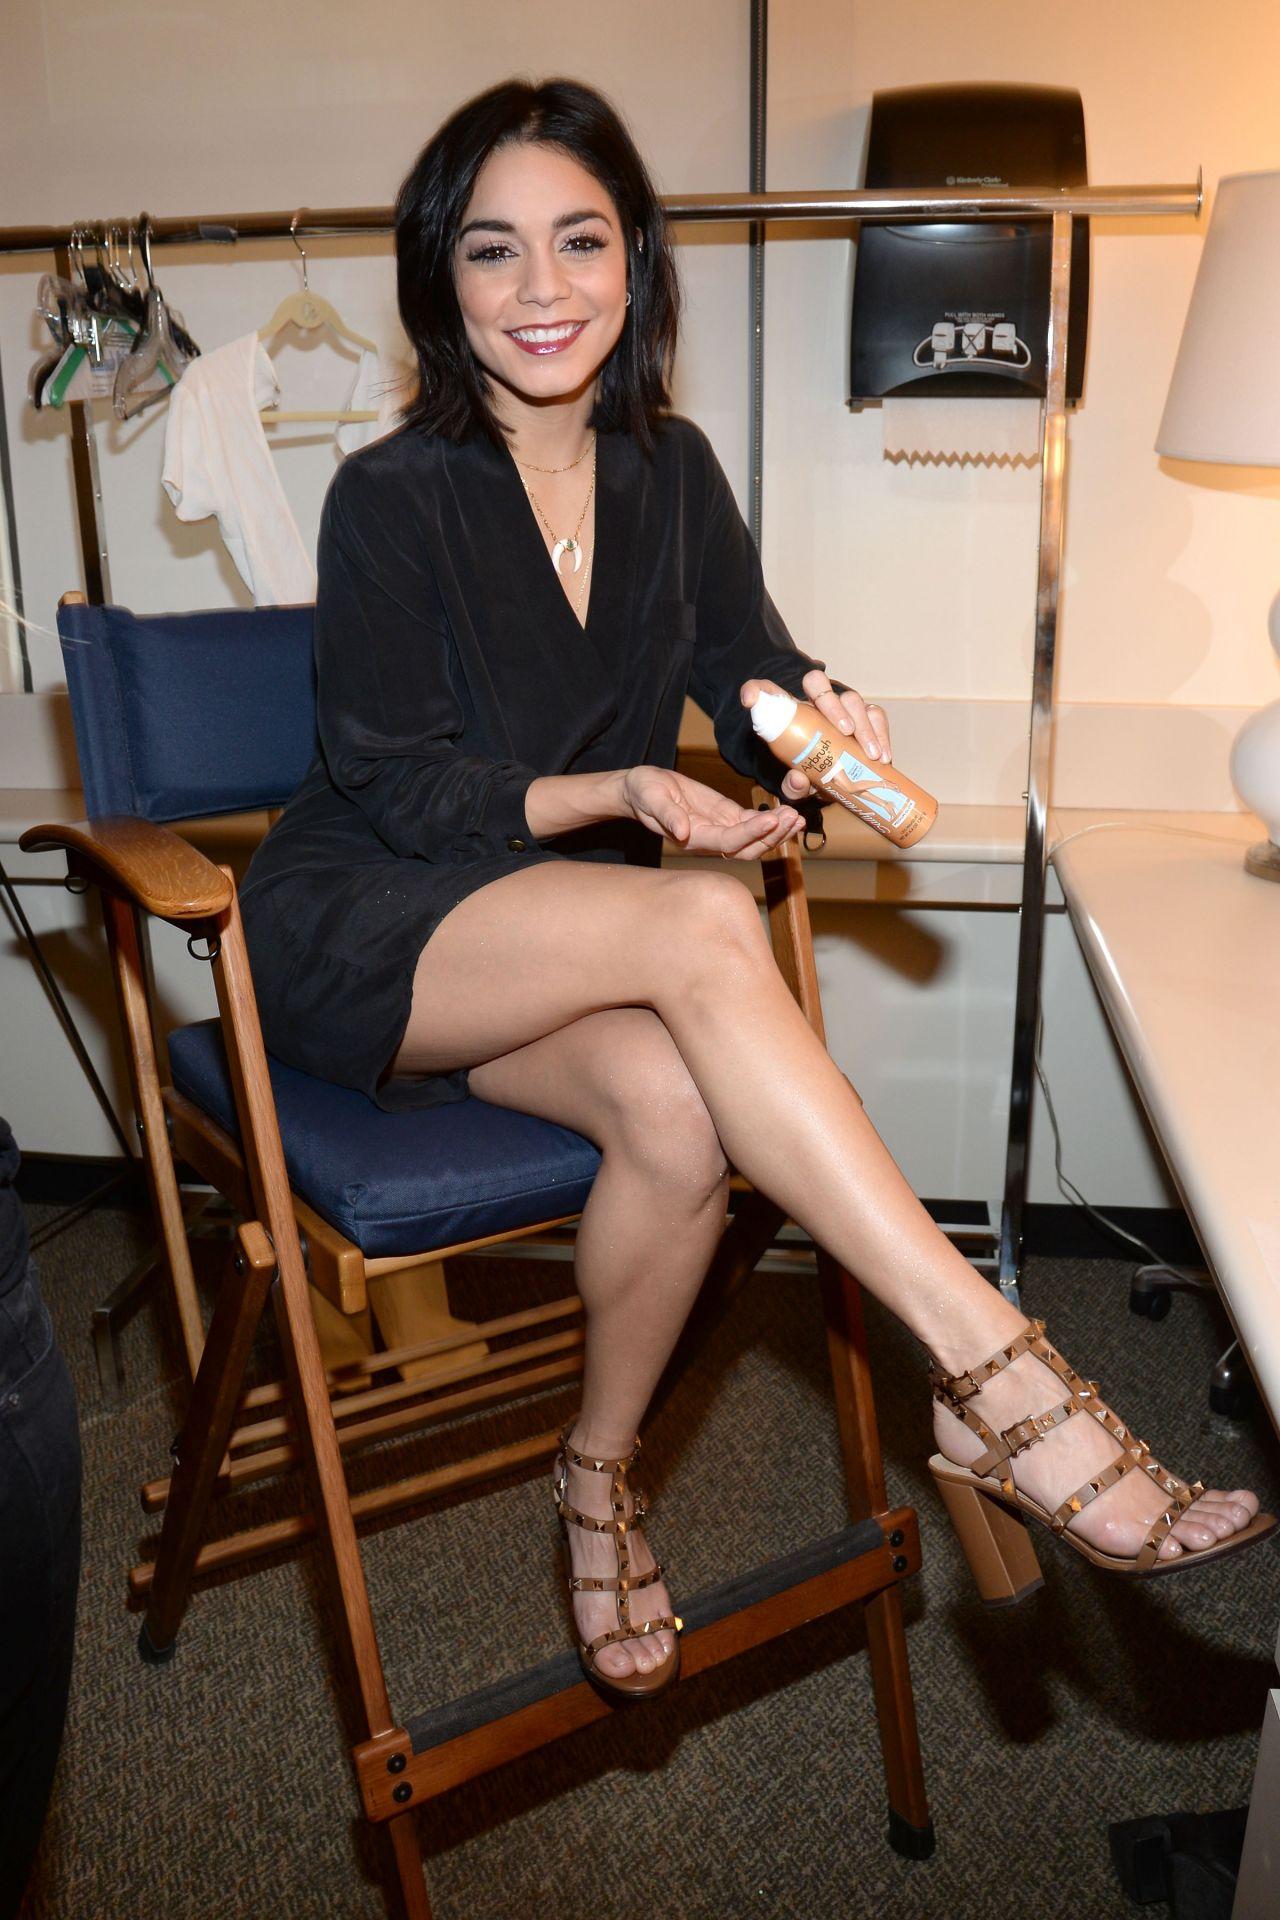 Vanessa Hudgens Backstage At Abc Studios In New York